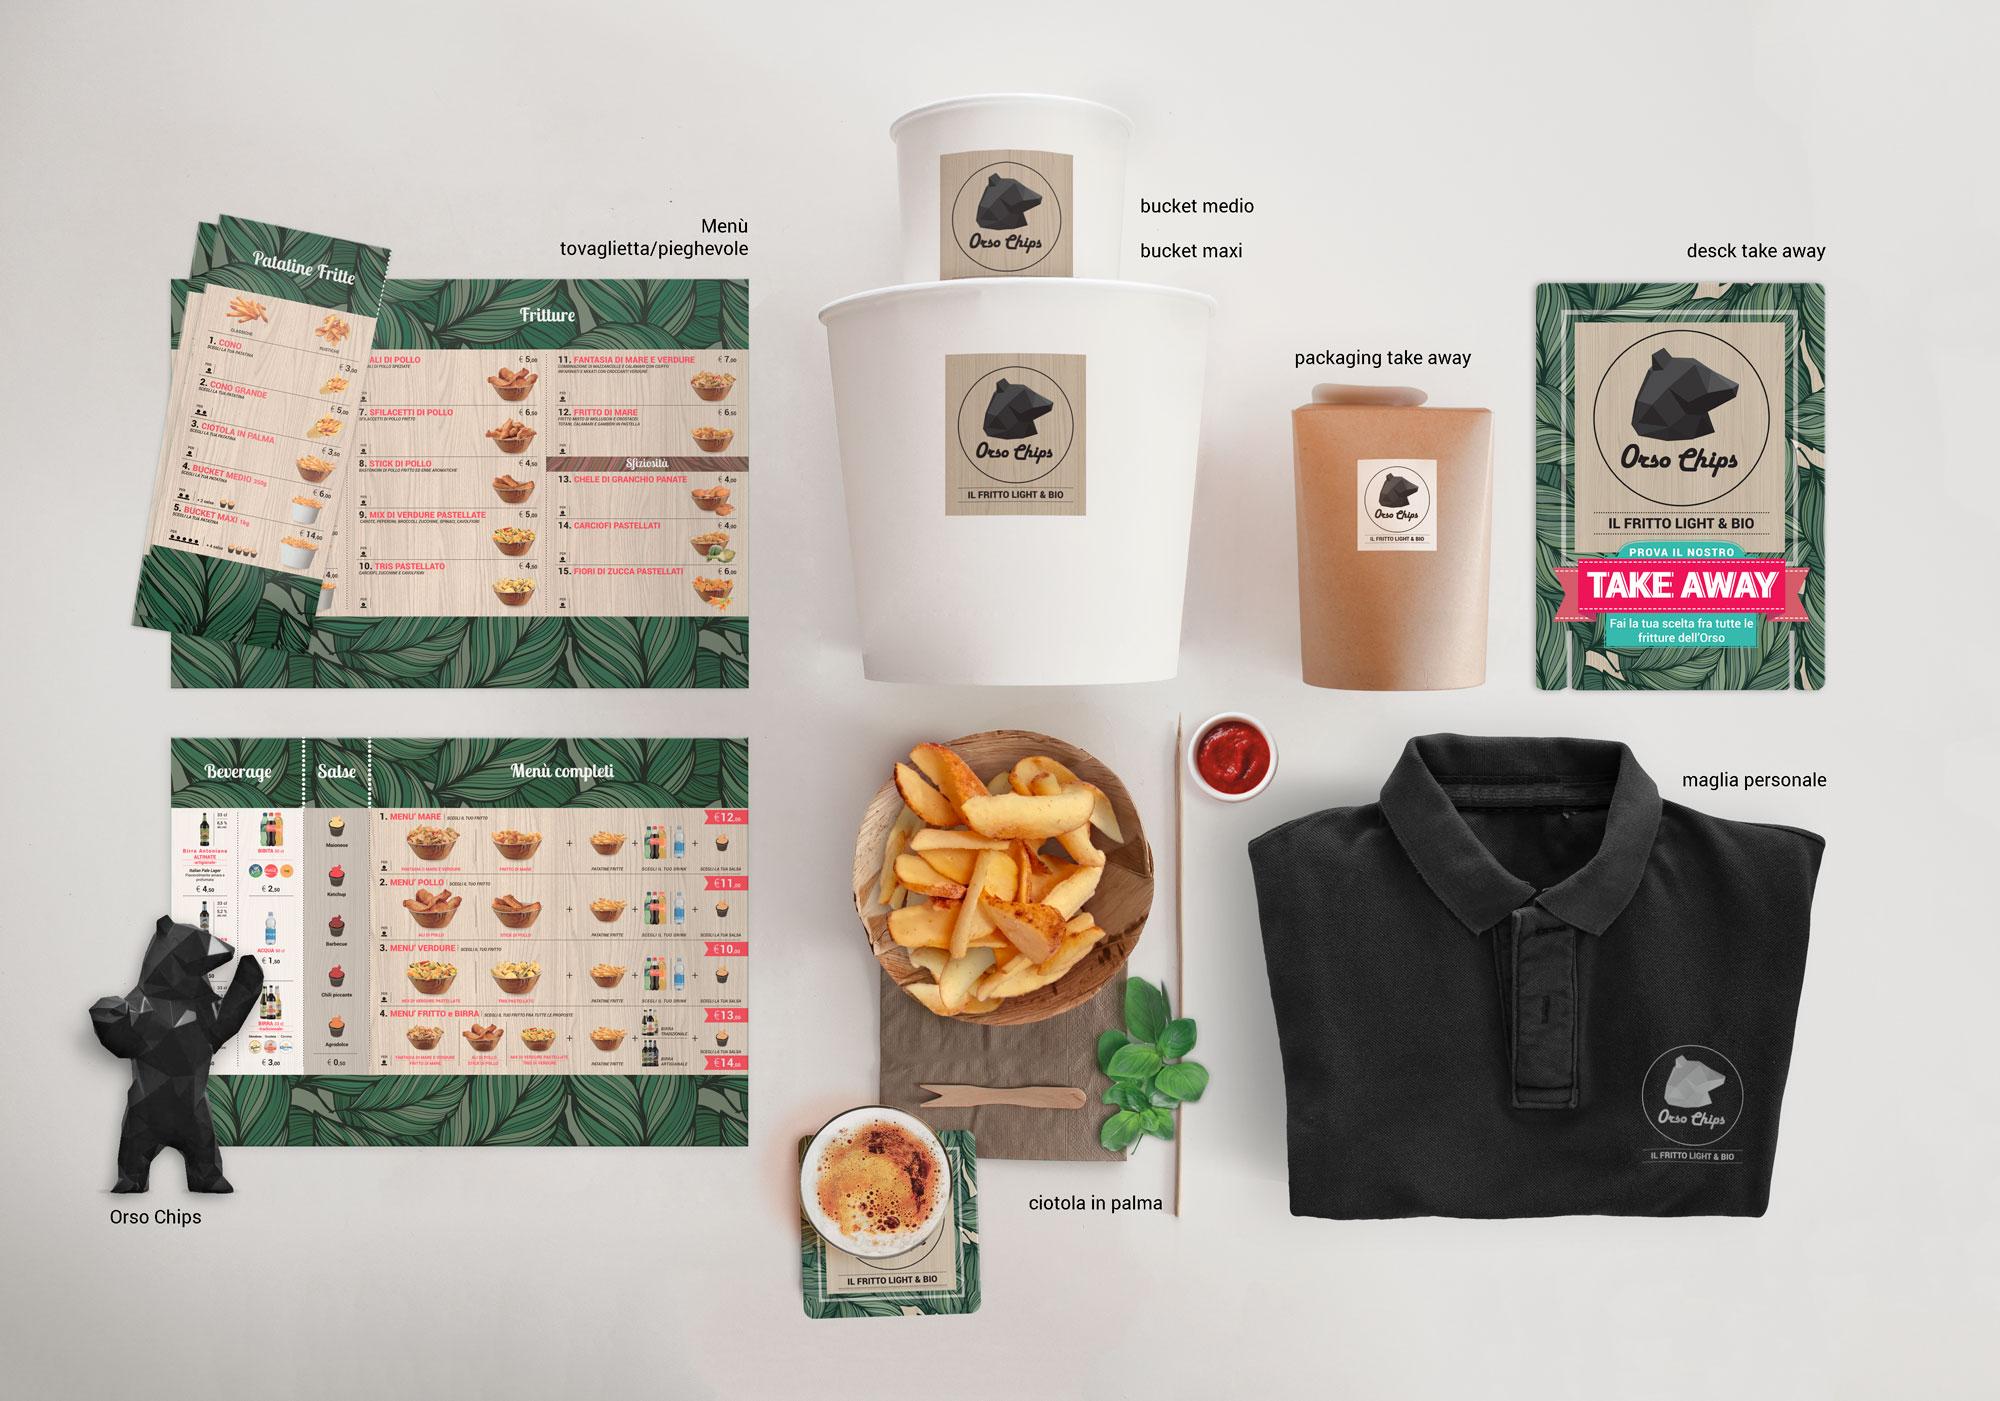 brand-image-Orso Chips/AC-Design